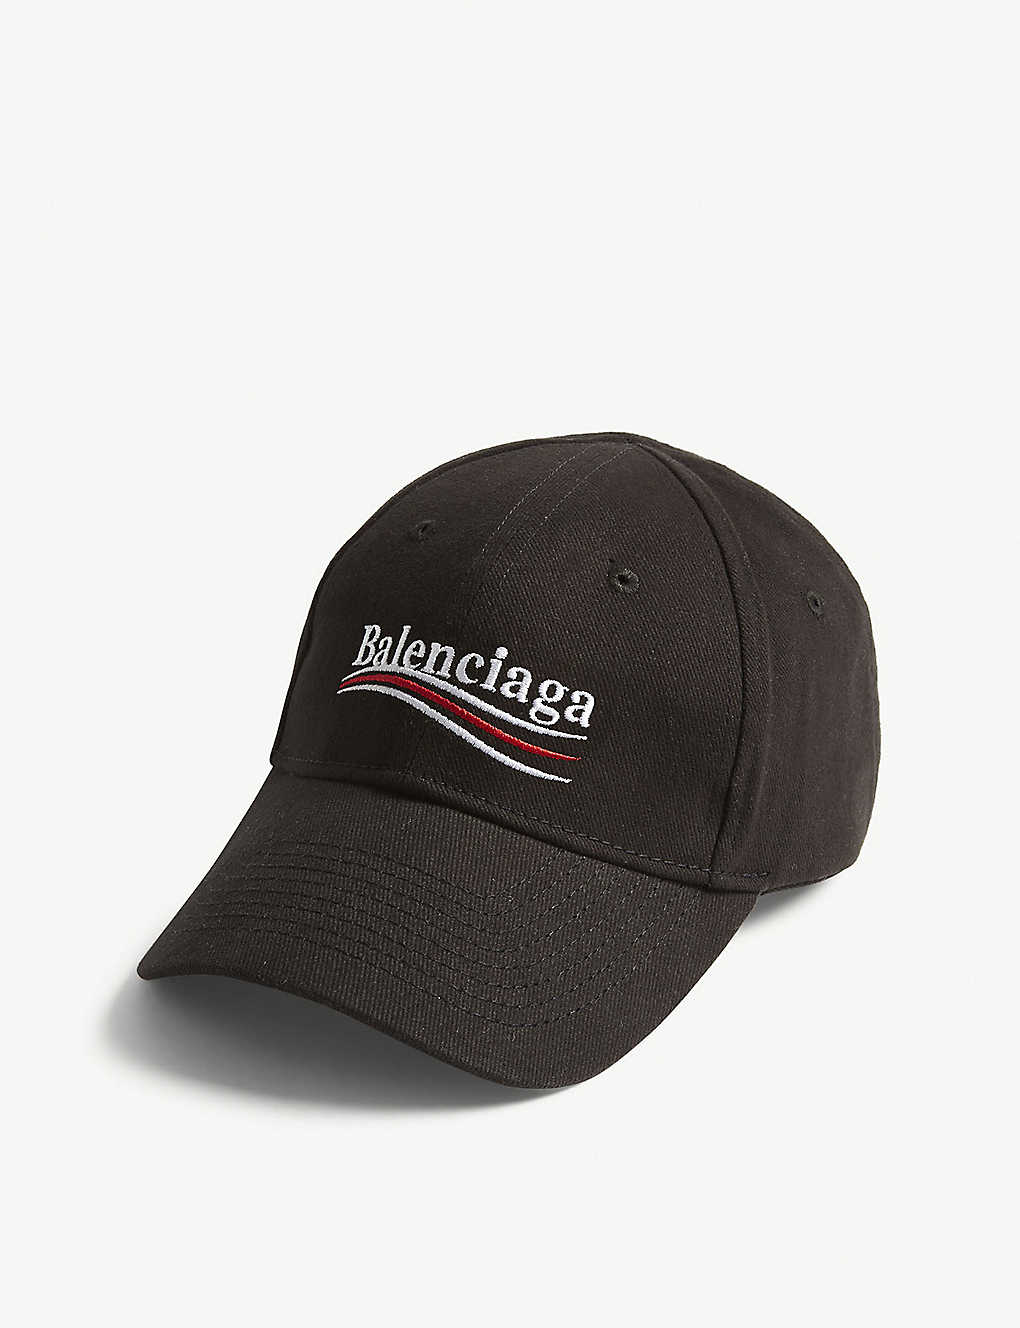 077531c5314 BALENCIAGA - Bernie logo cotton strapback cap